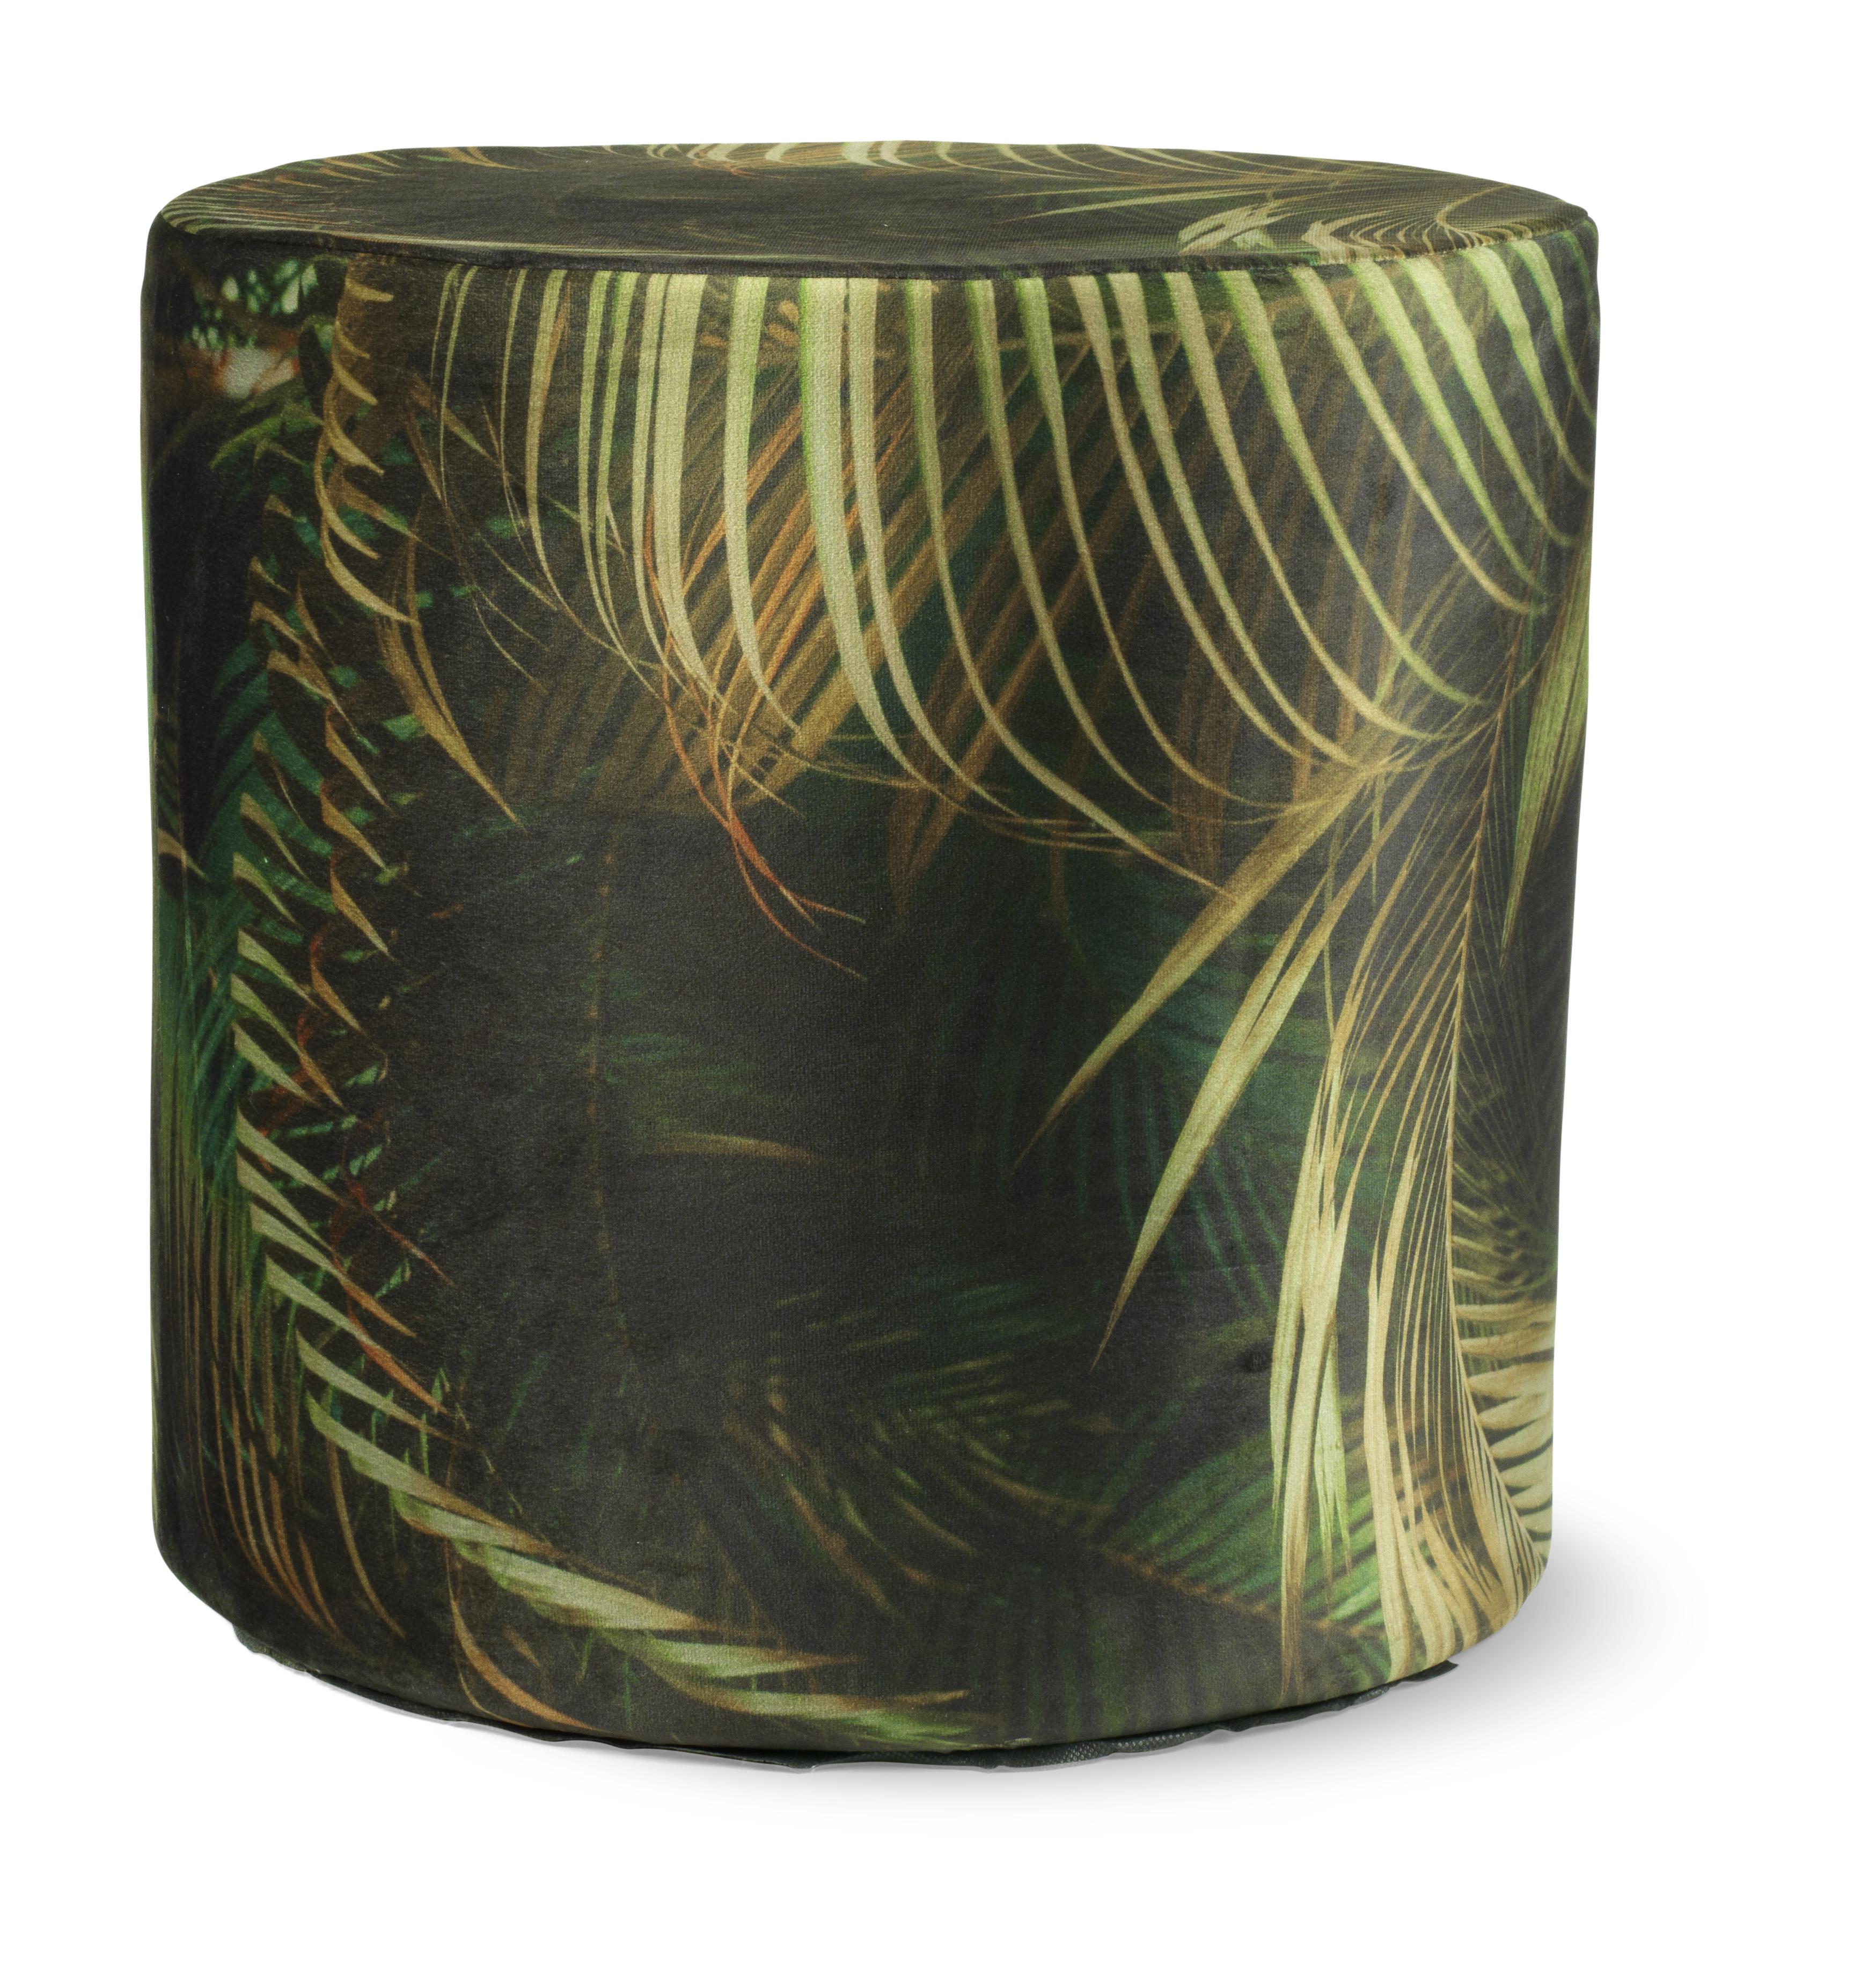 YADE - Poef groen 40x40x40 cm